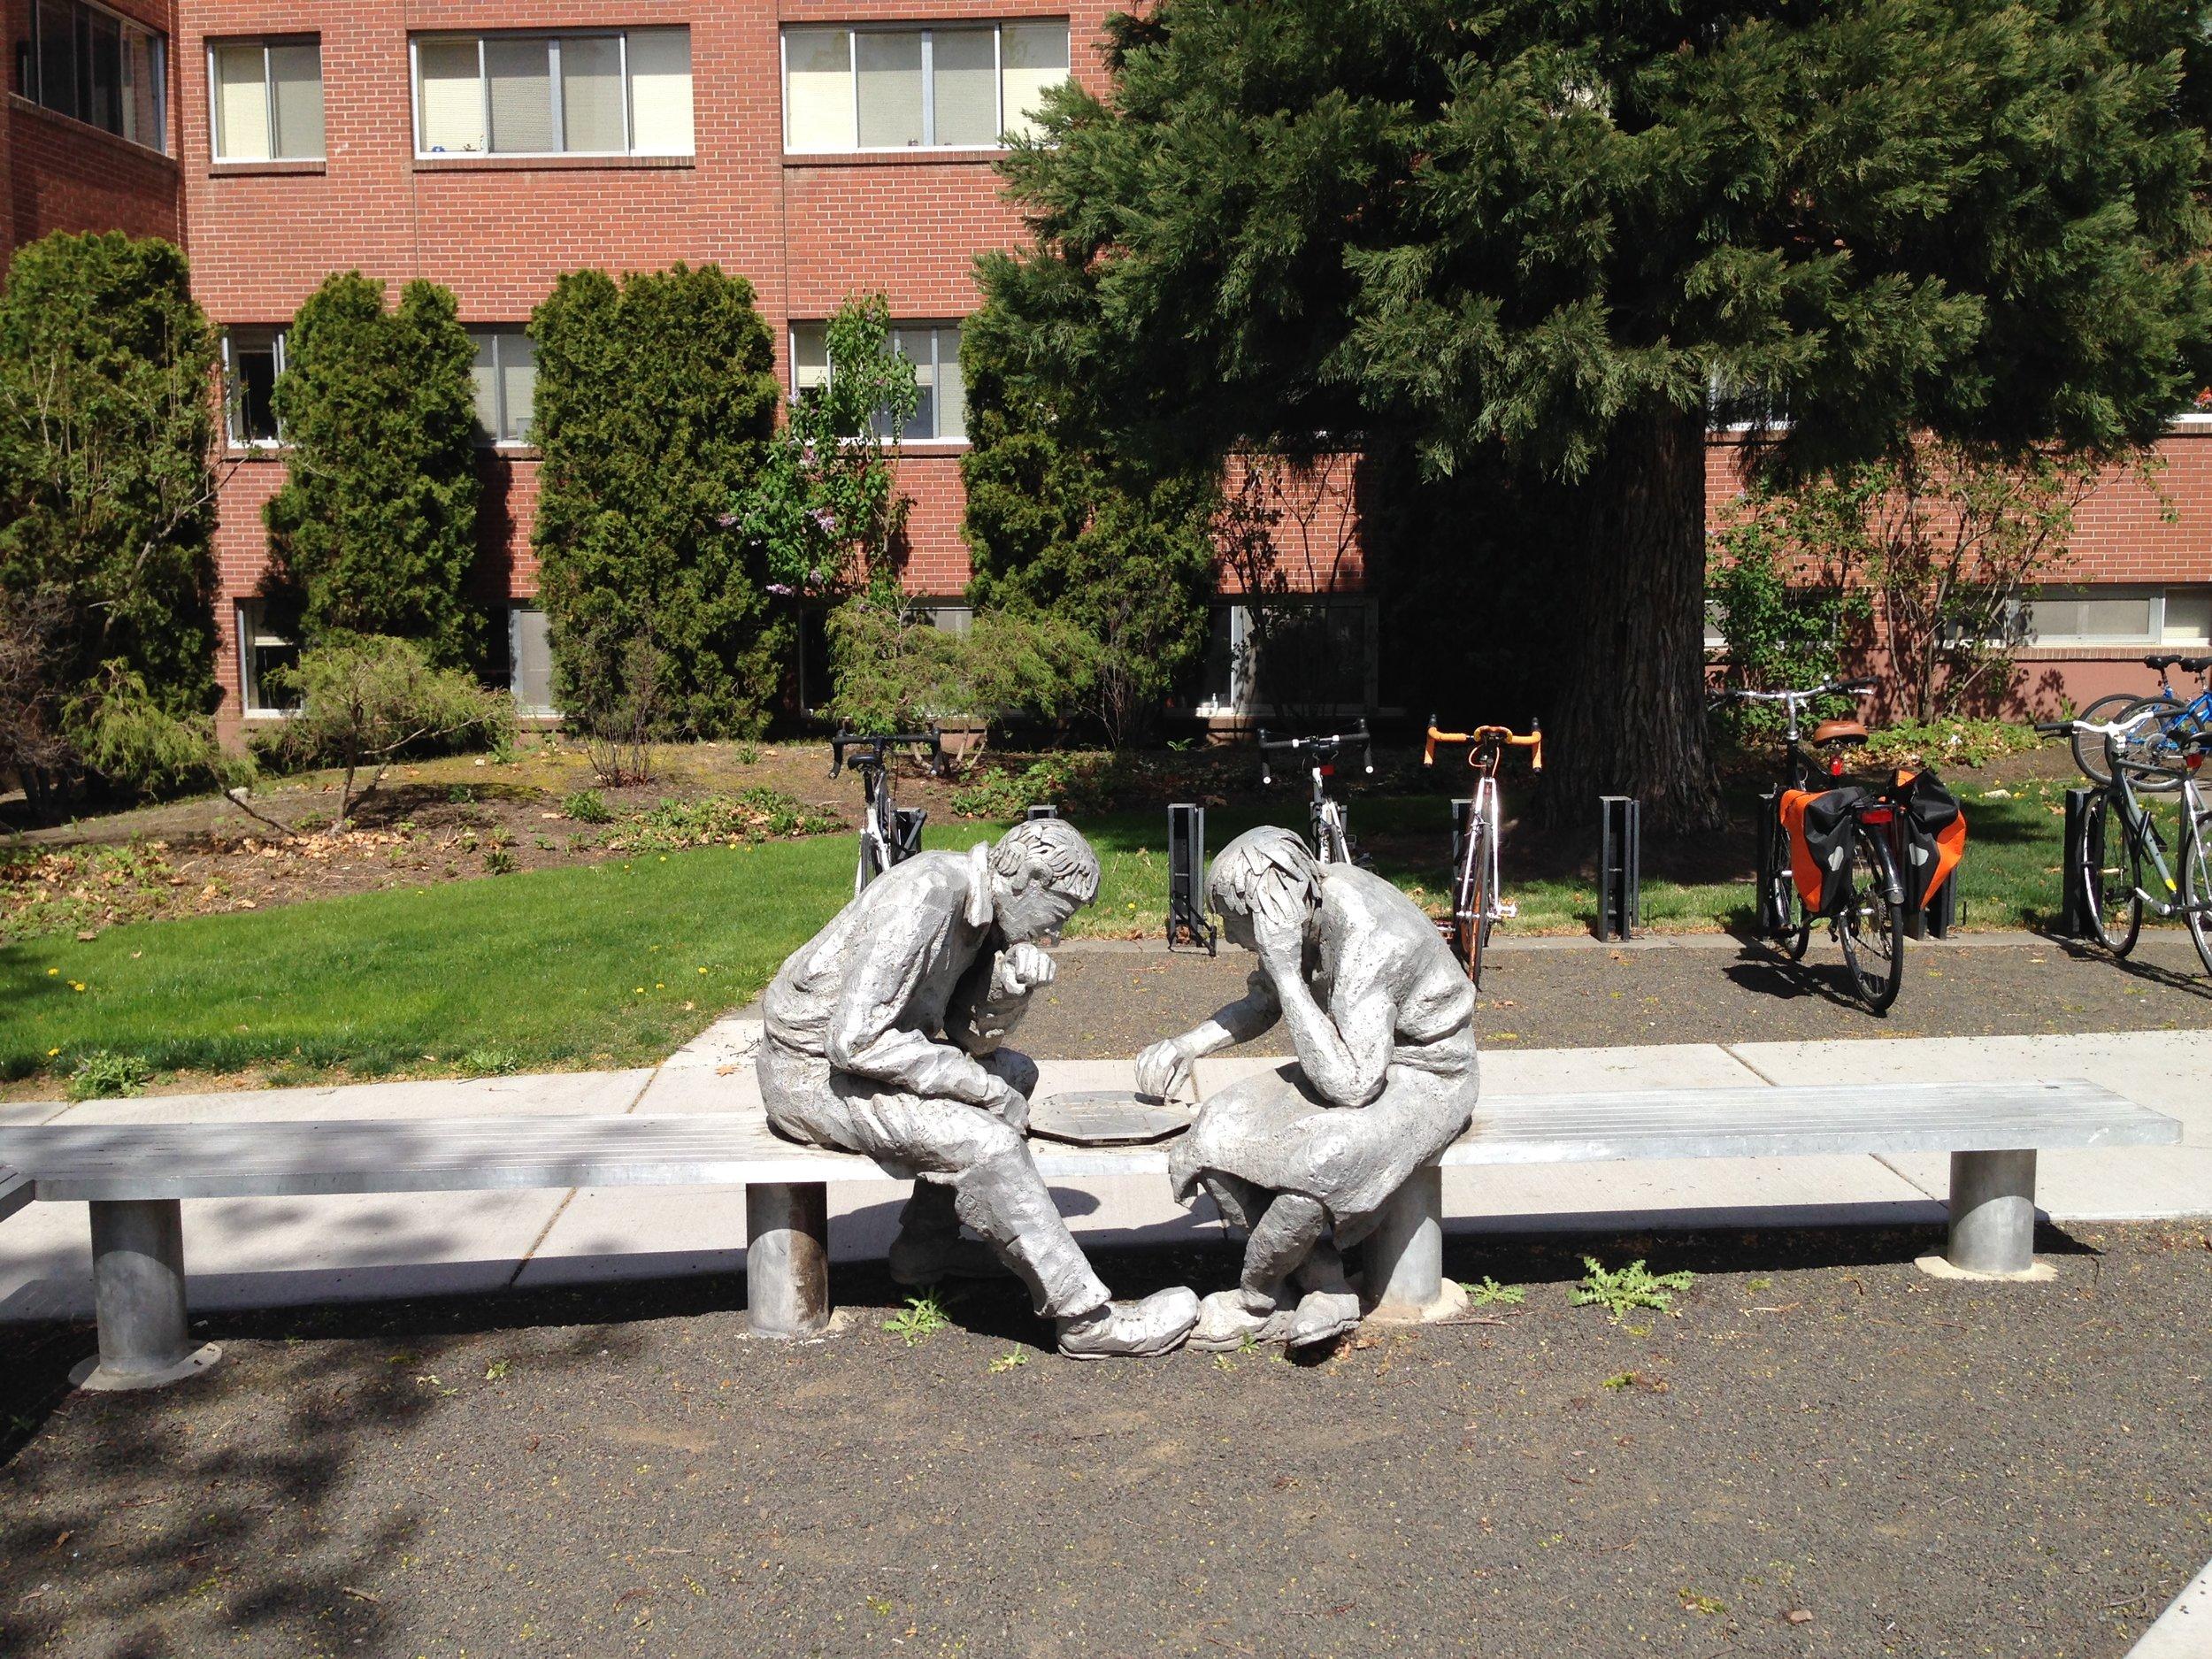 Whitman College art & residence hall